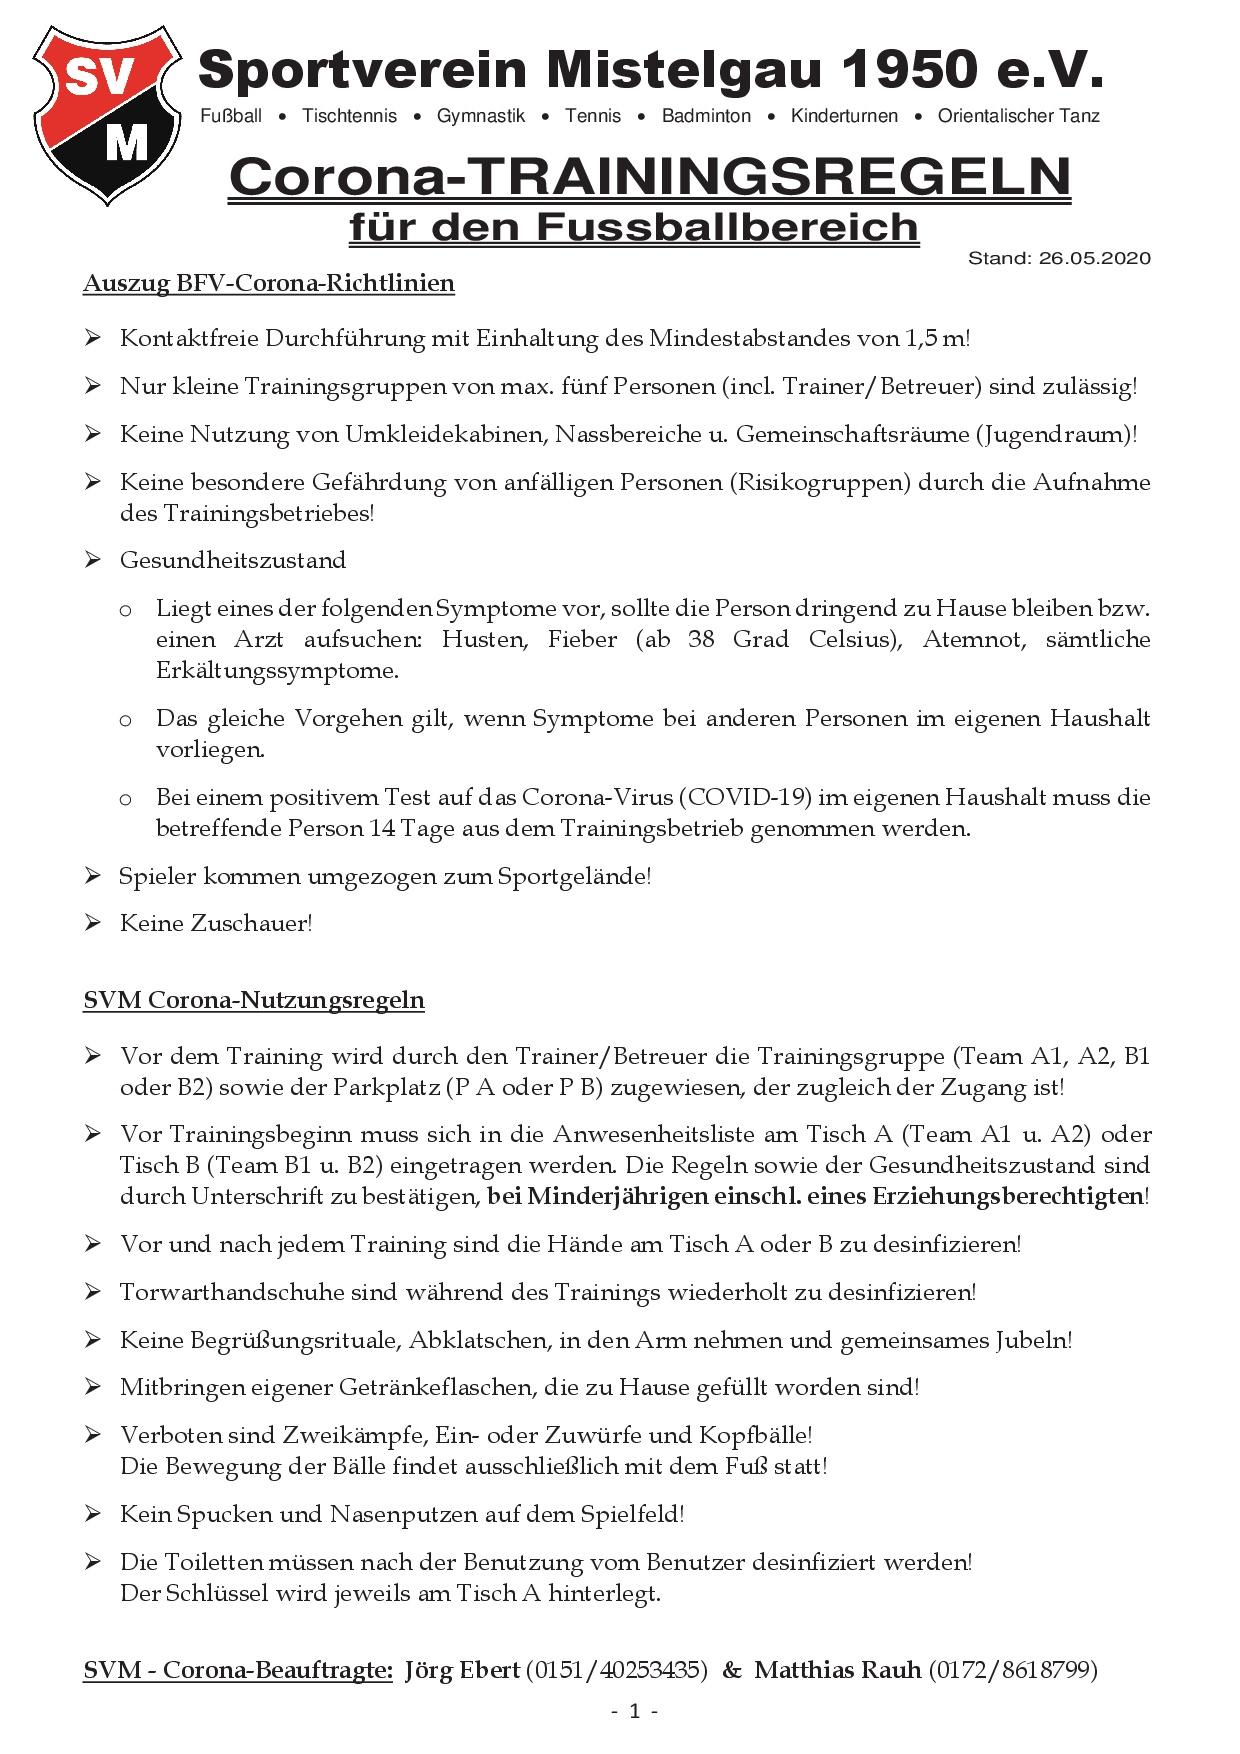 Covid19_Trainingsregeln_20200526.pdf